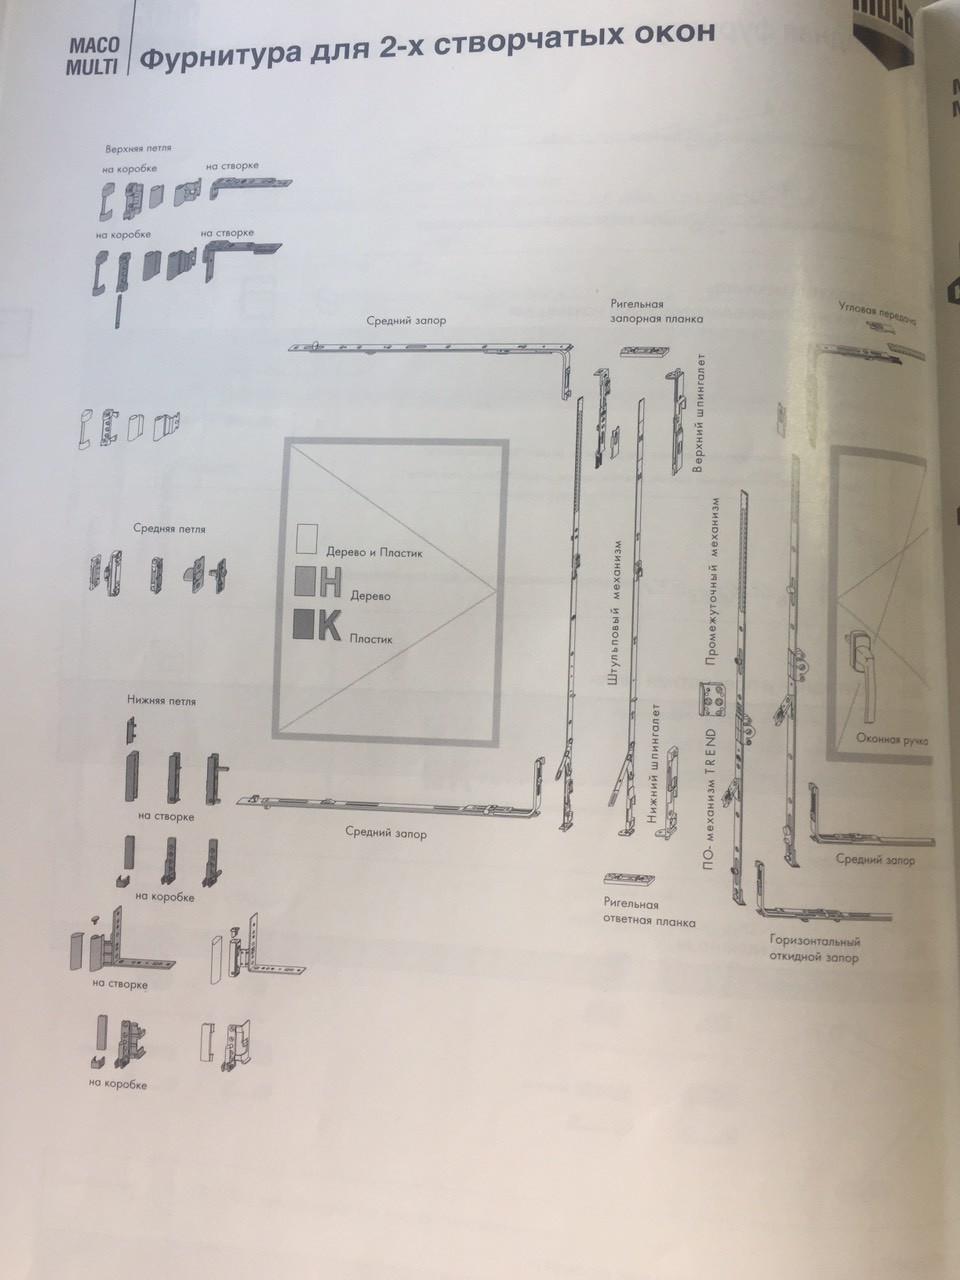 Dk_MACO_52407_П/О механизм фикс. Gr.5 VZ 1501-1750 GM 700